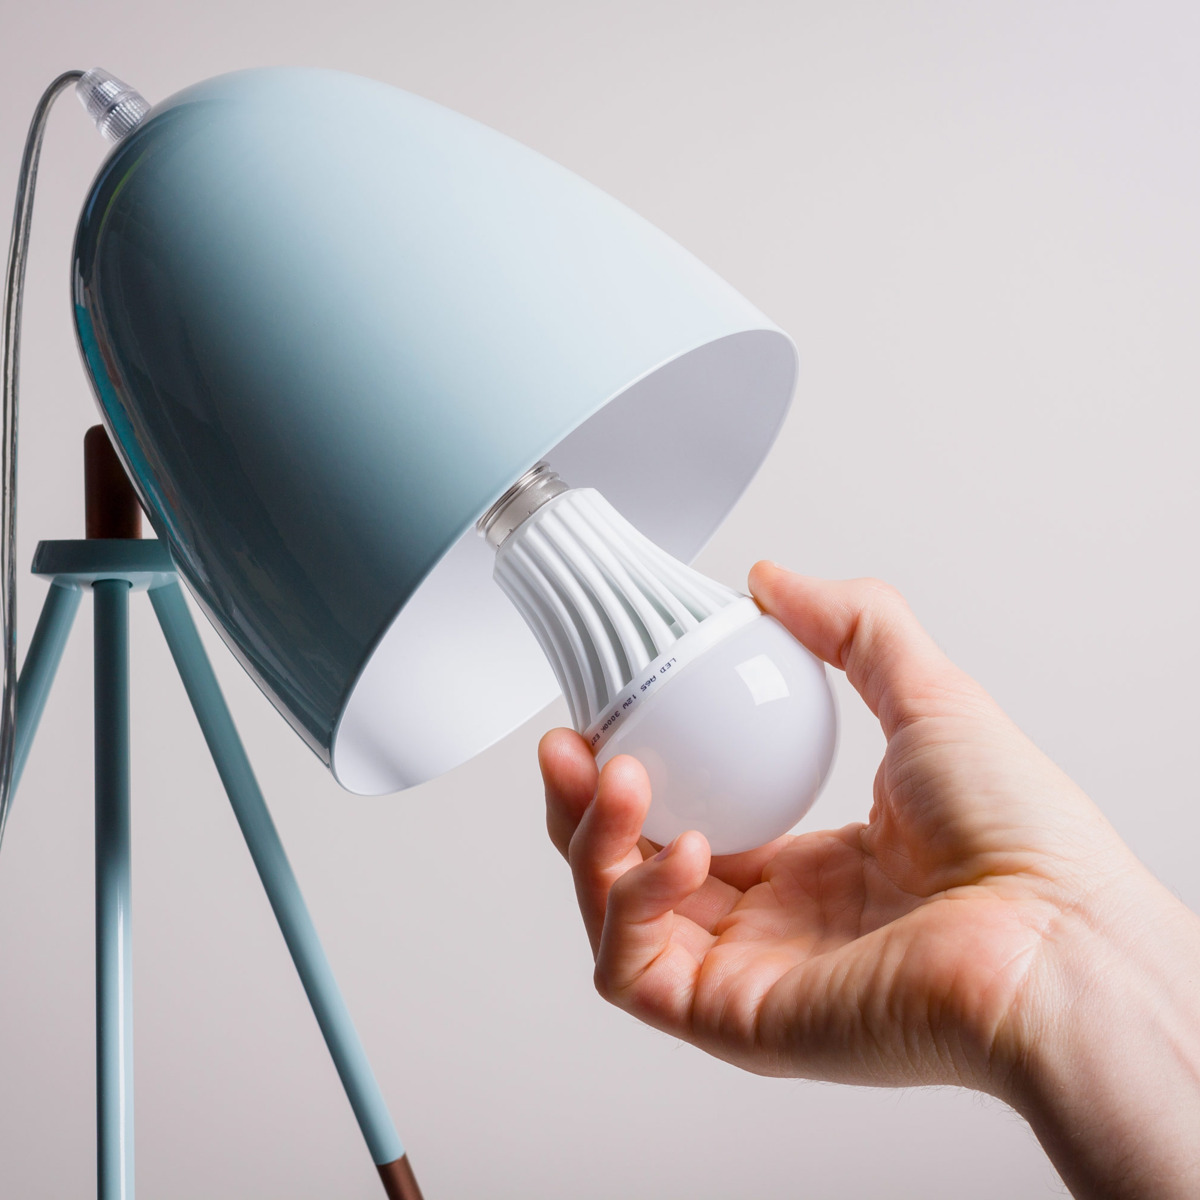 6 Energy-Efficient Light Bulbs That Actually Look Good: 2018